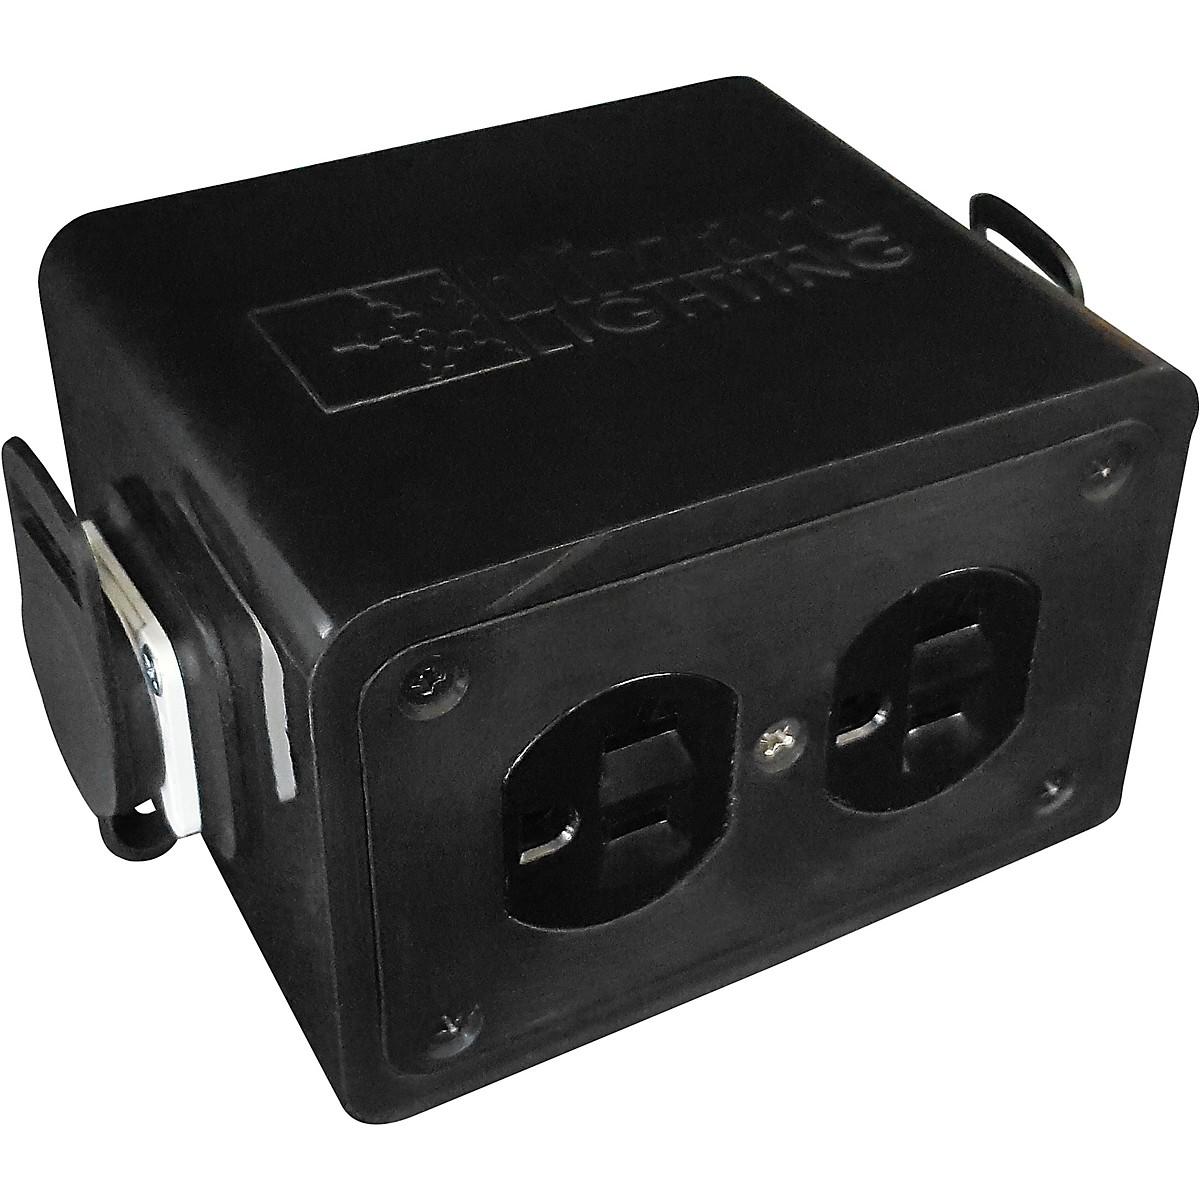 Blizzard Drop PC PowerCON to Edison Stage Power Drop Box